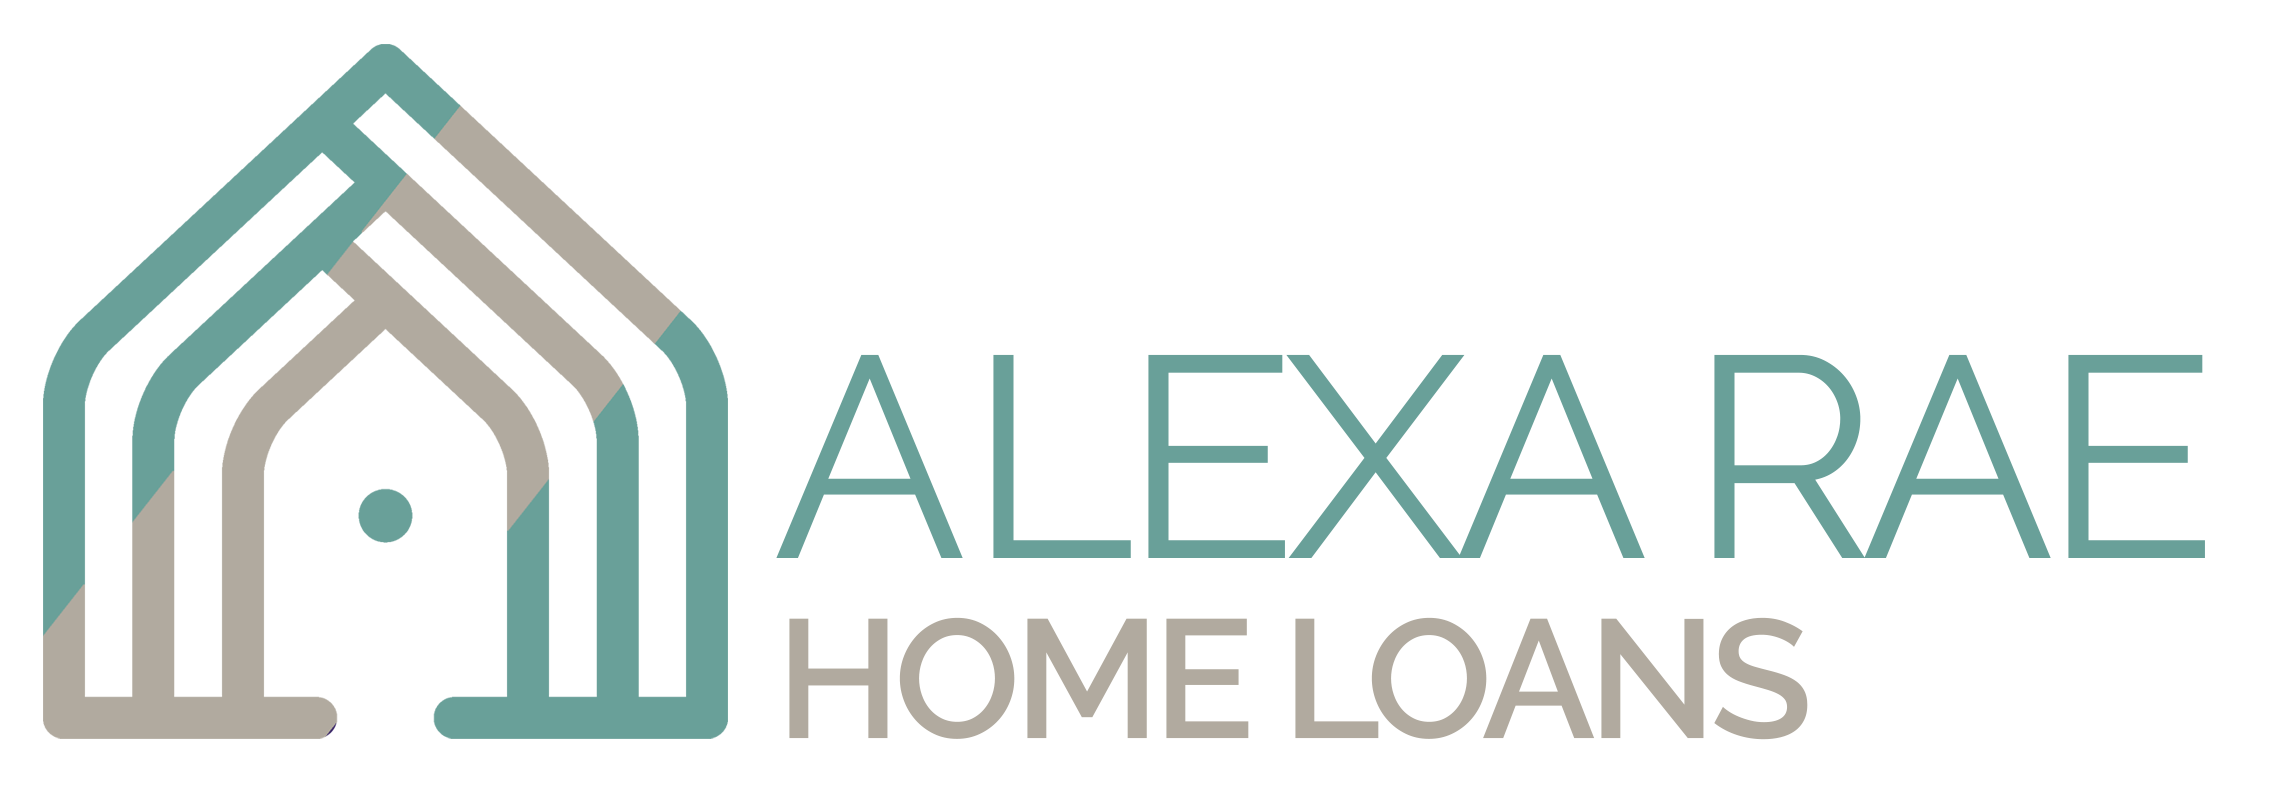 Alexa Rae Home Loans